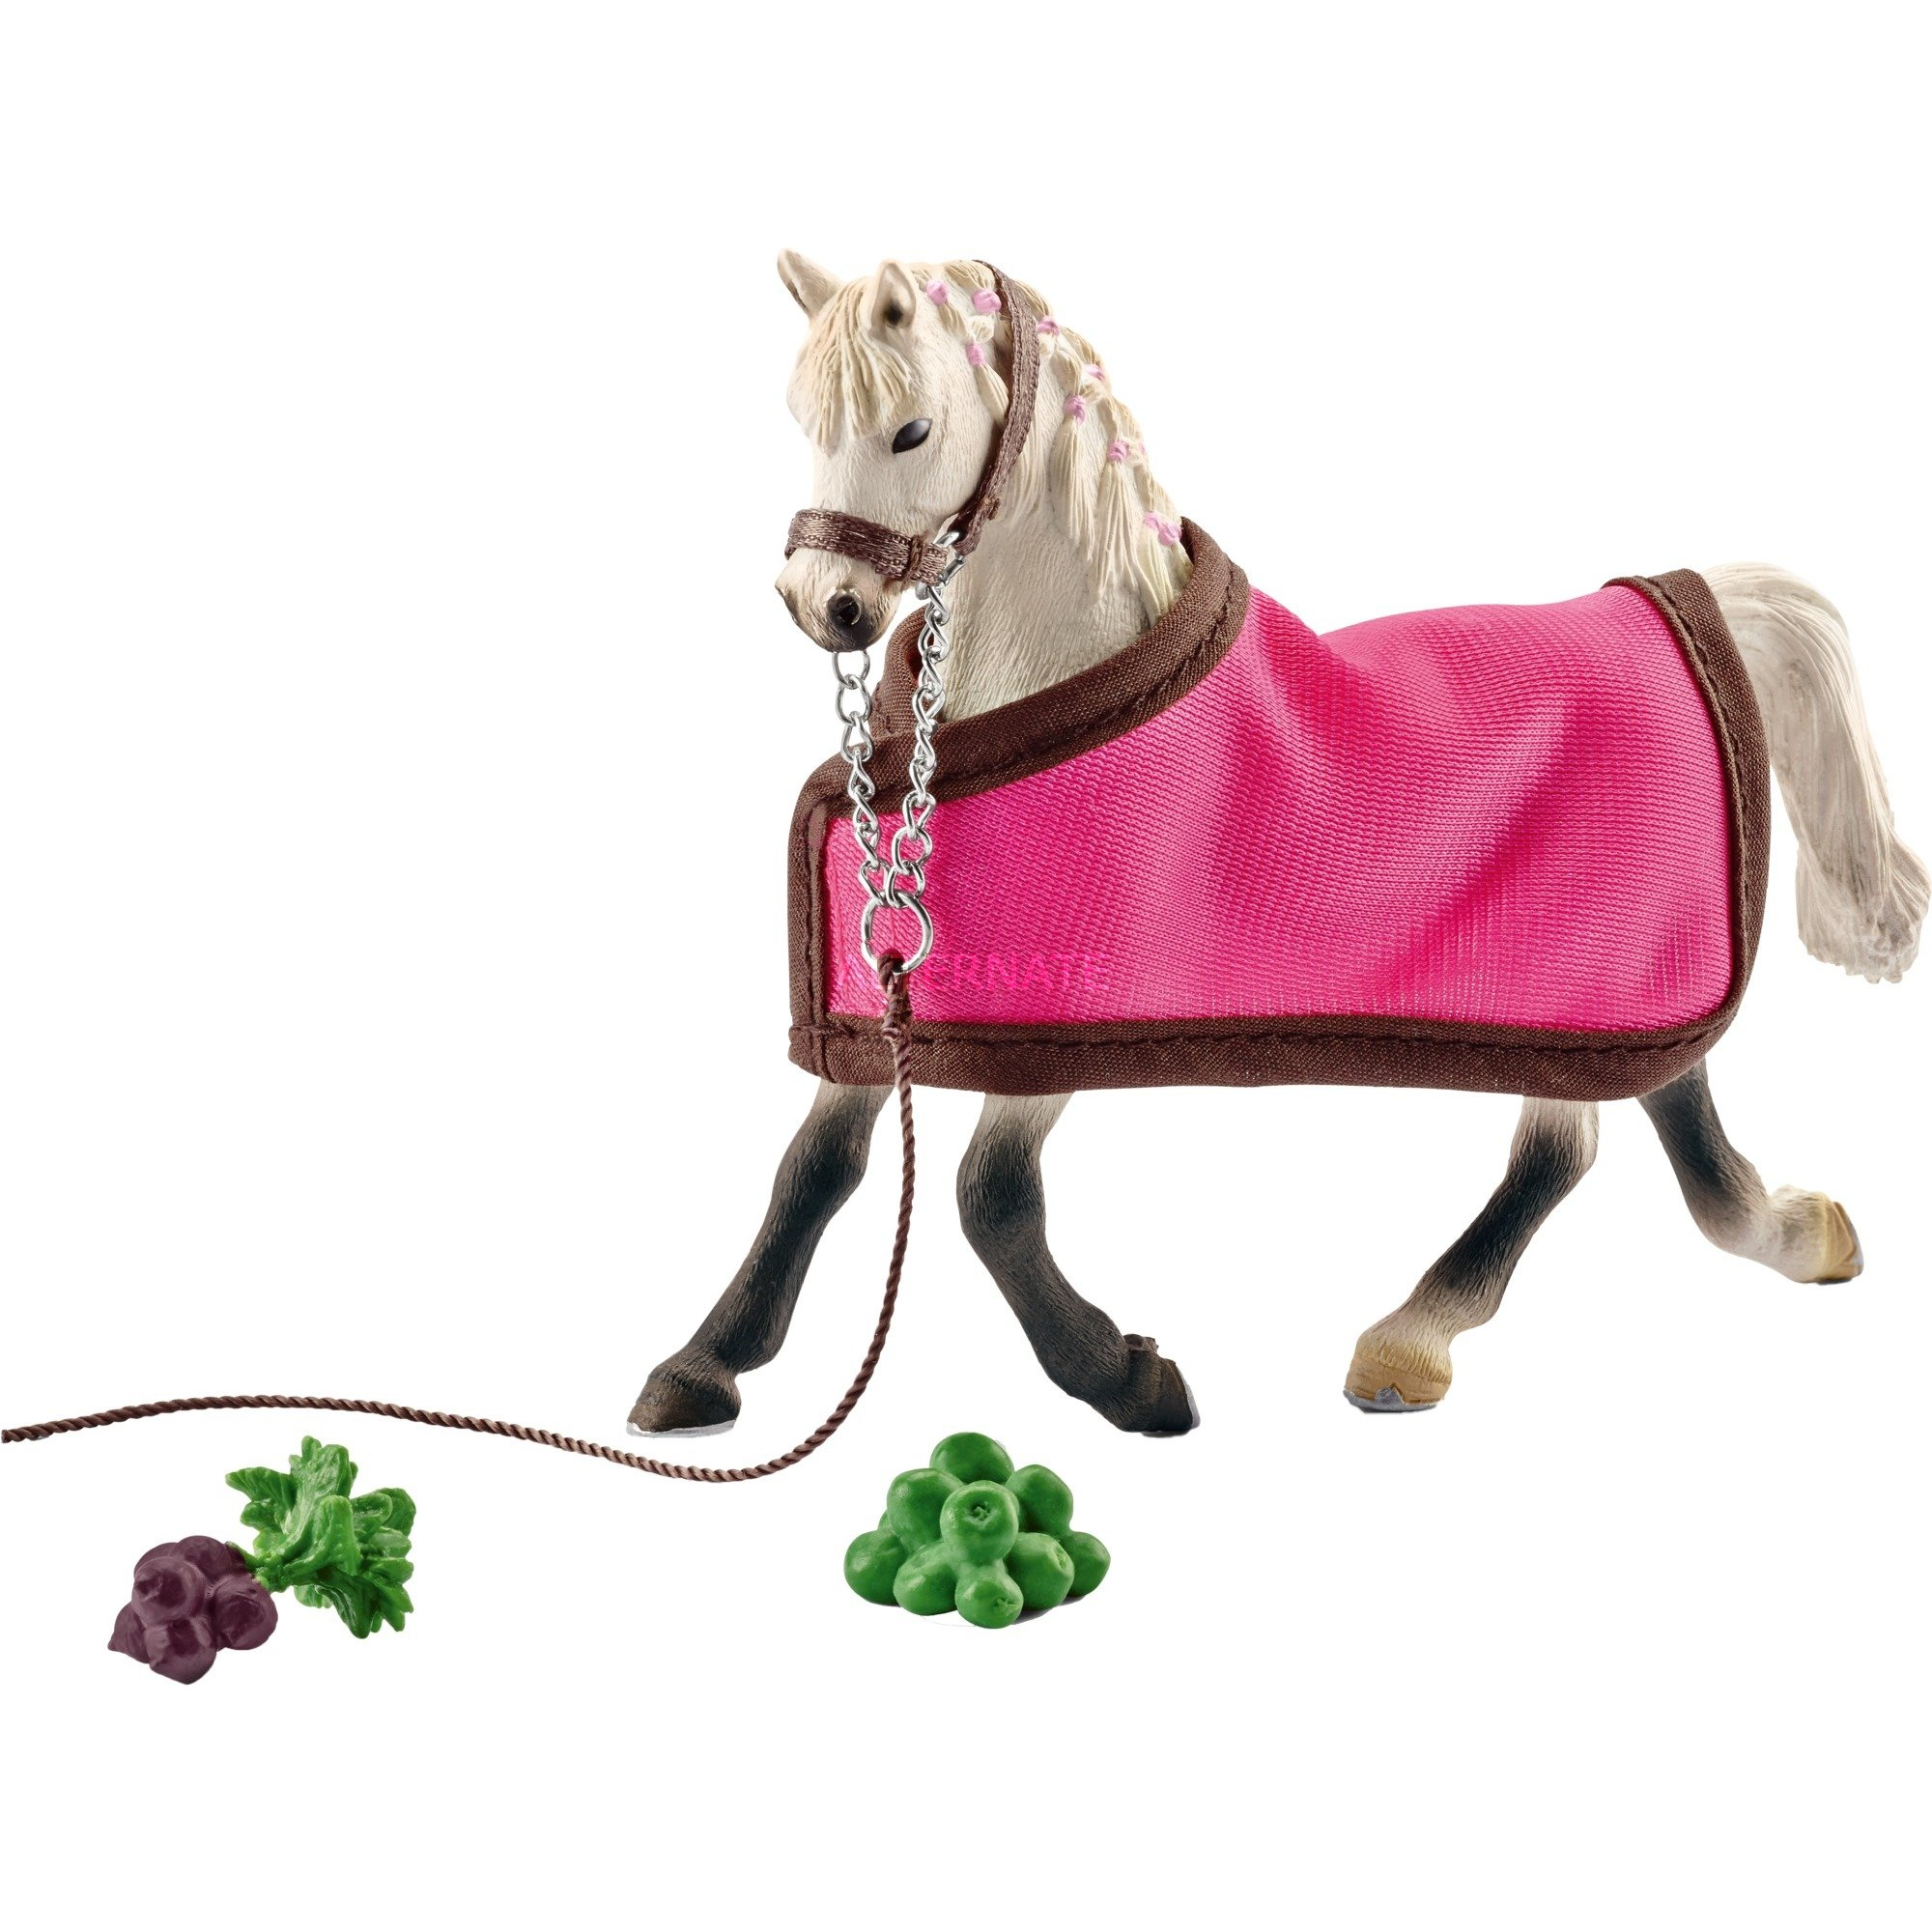 araberhoppe-med-tappe-41447-hest-spil-figur